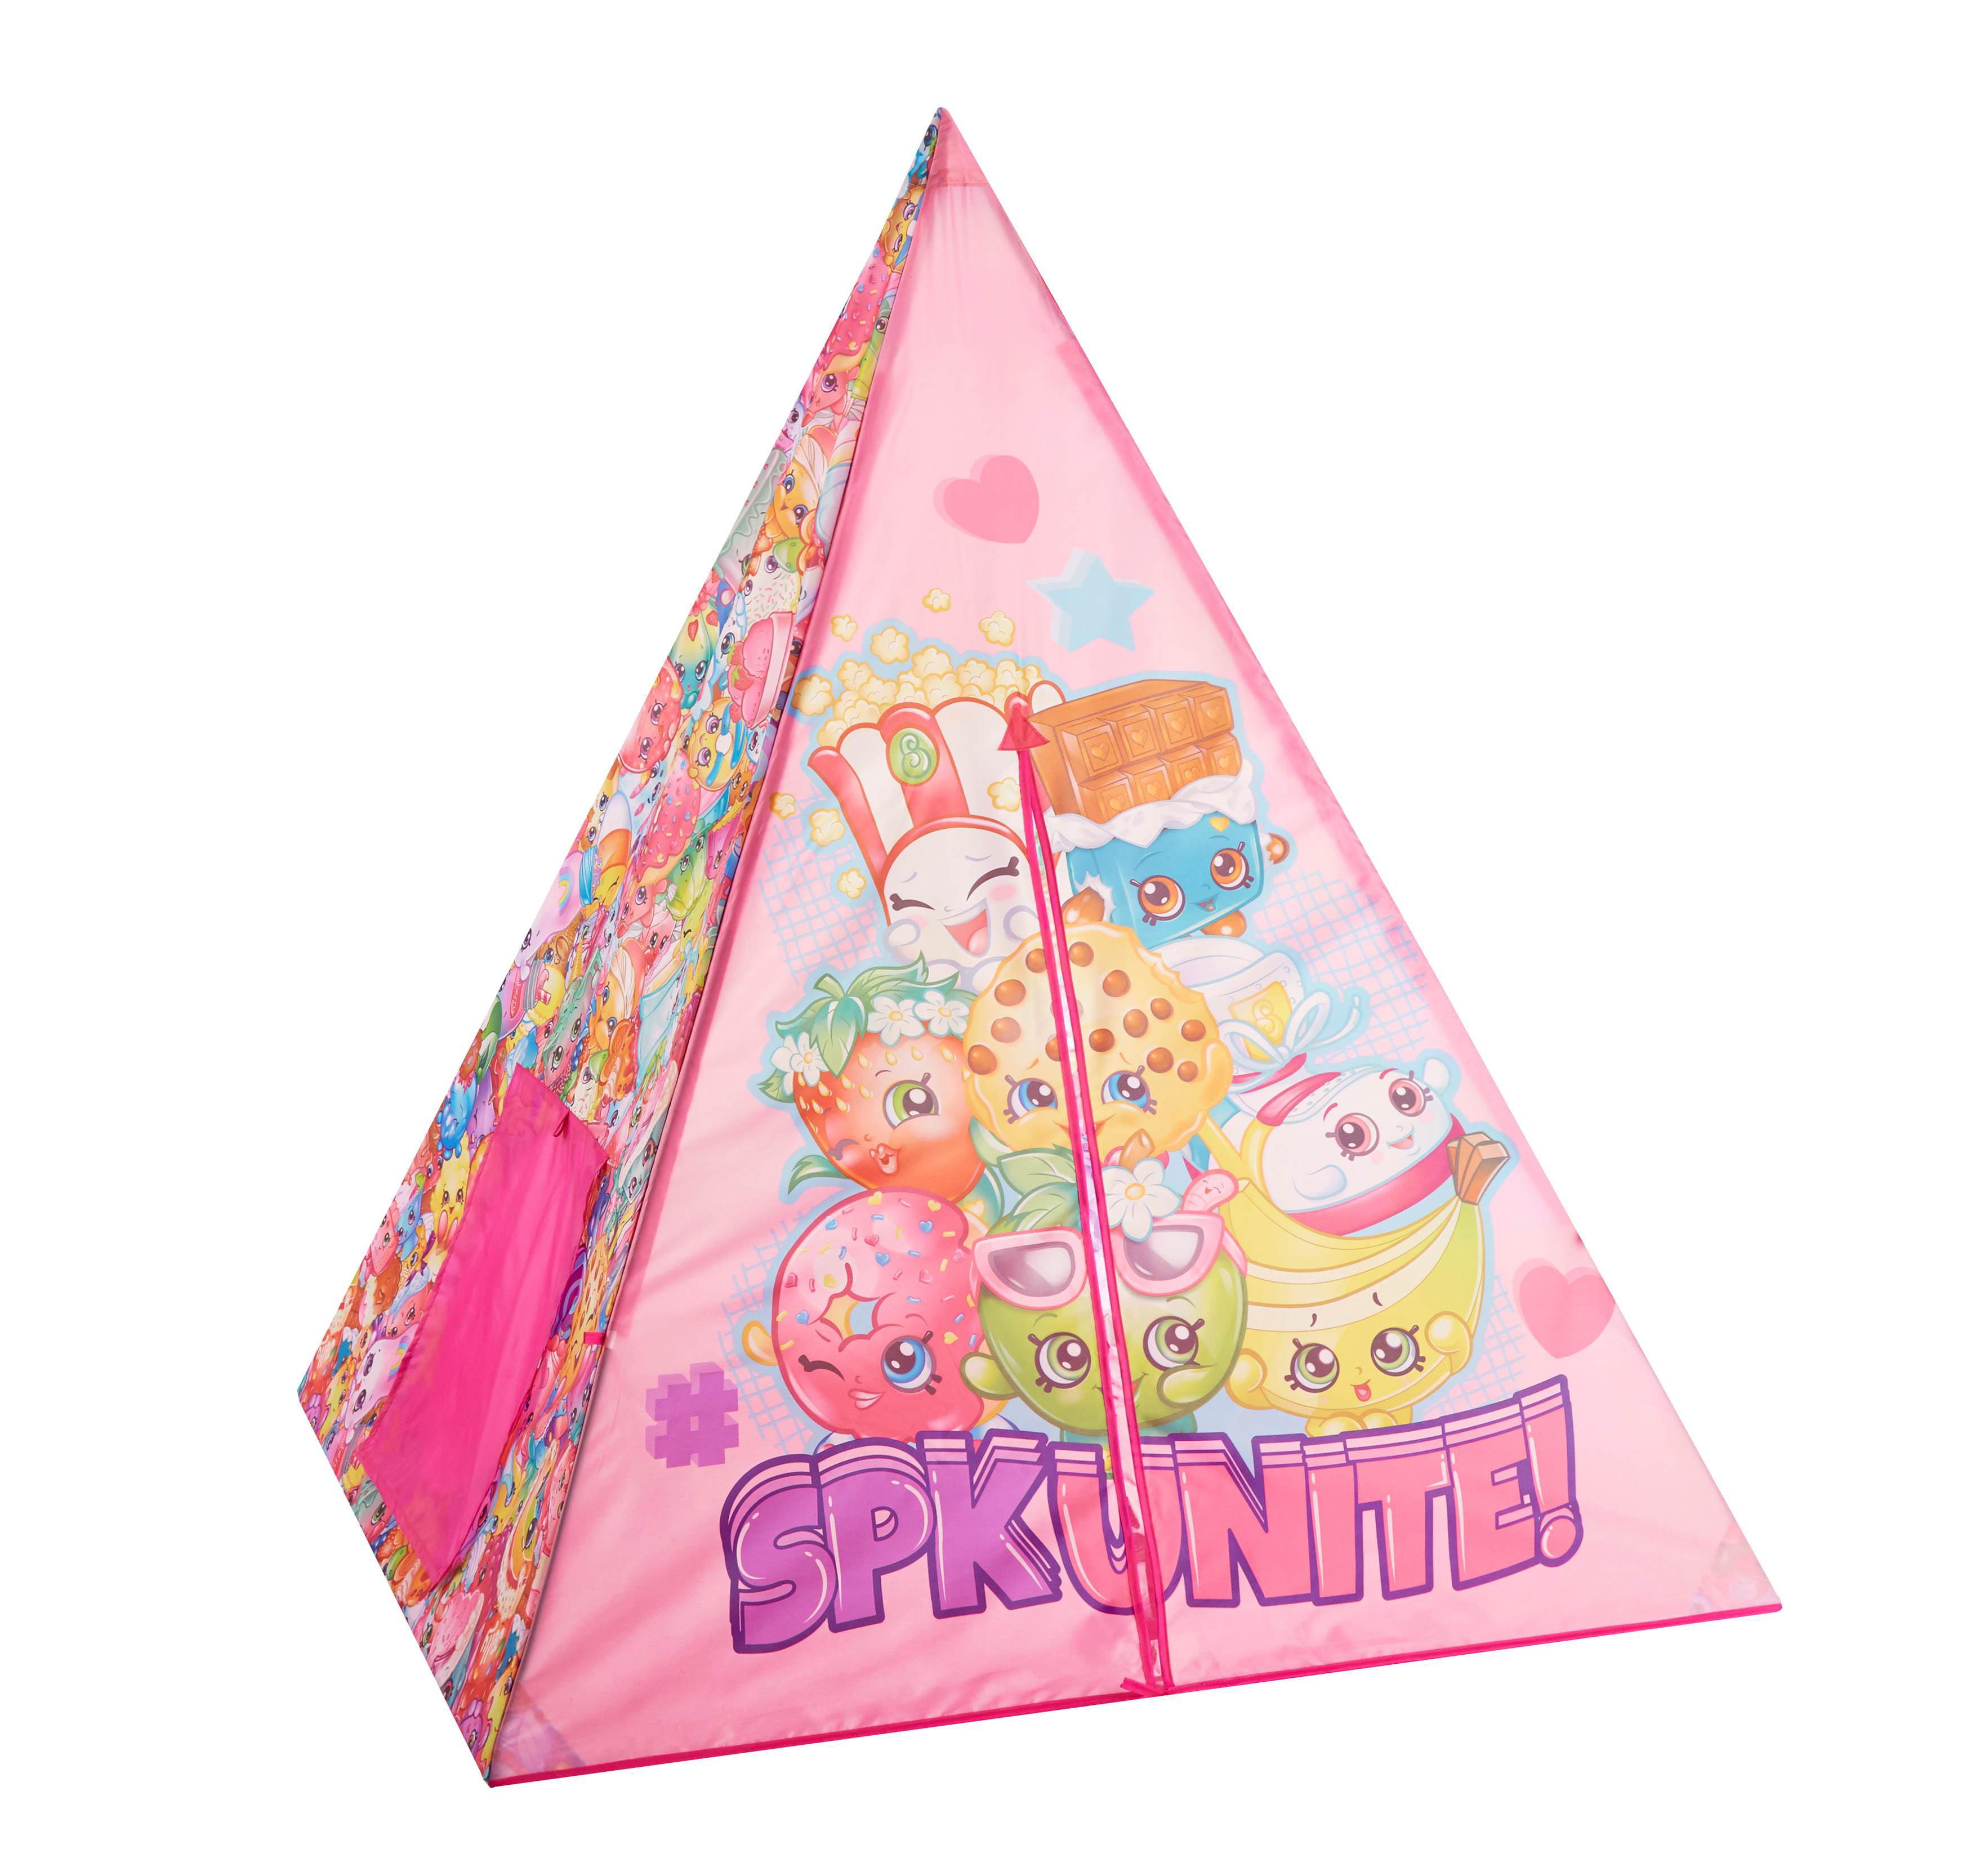 on sale 524f1 b6478 Shopkins Girls Teepee Tent Set, 4 Piece